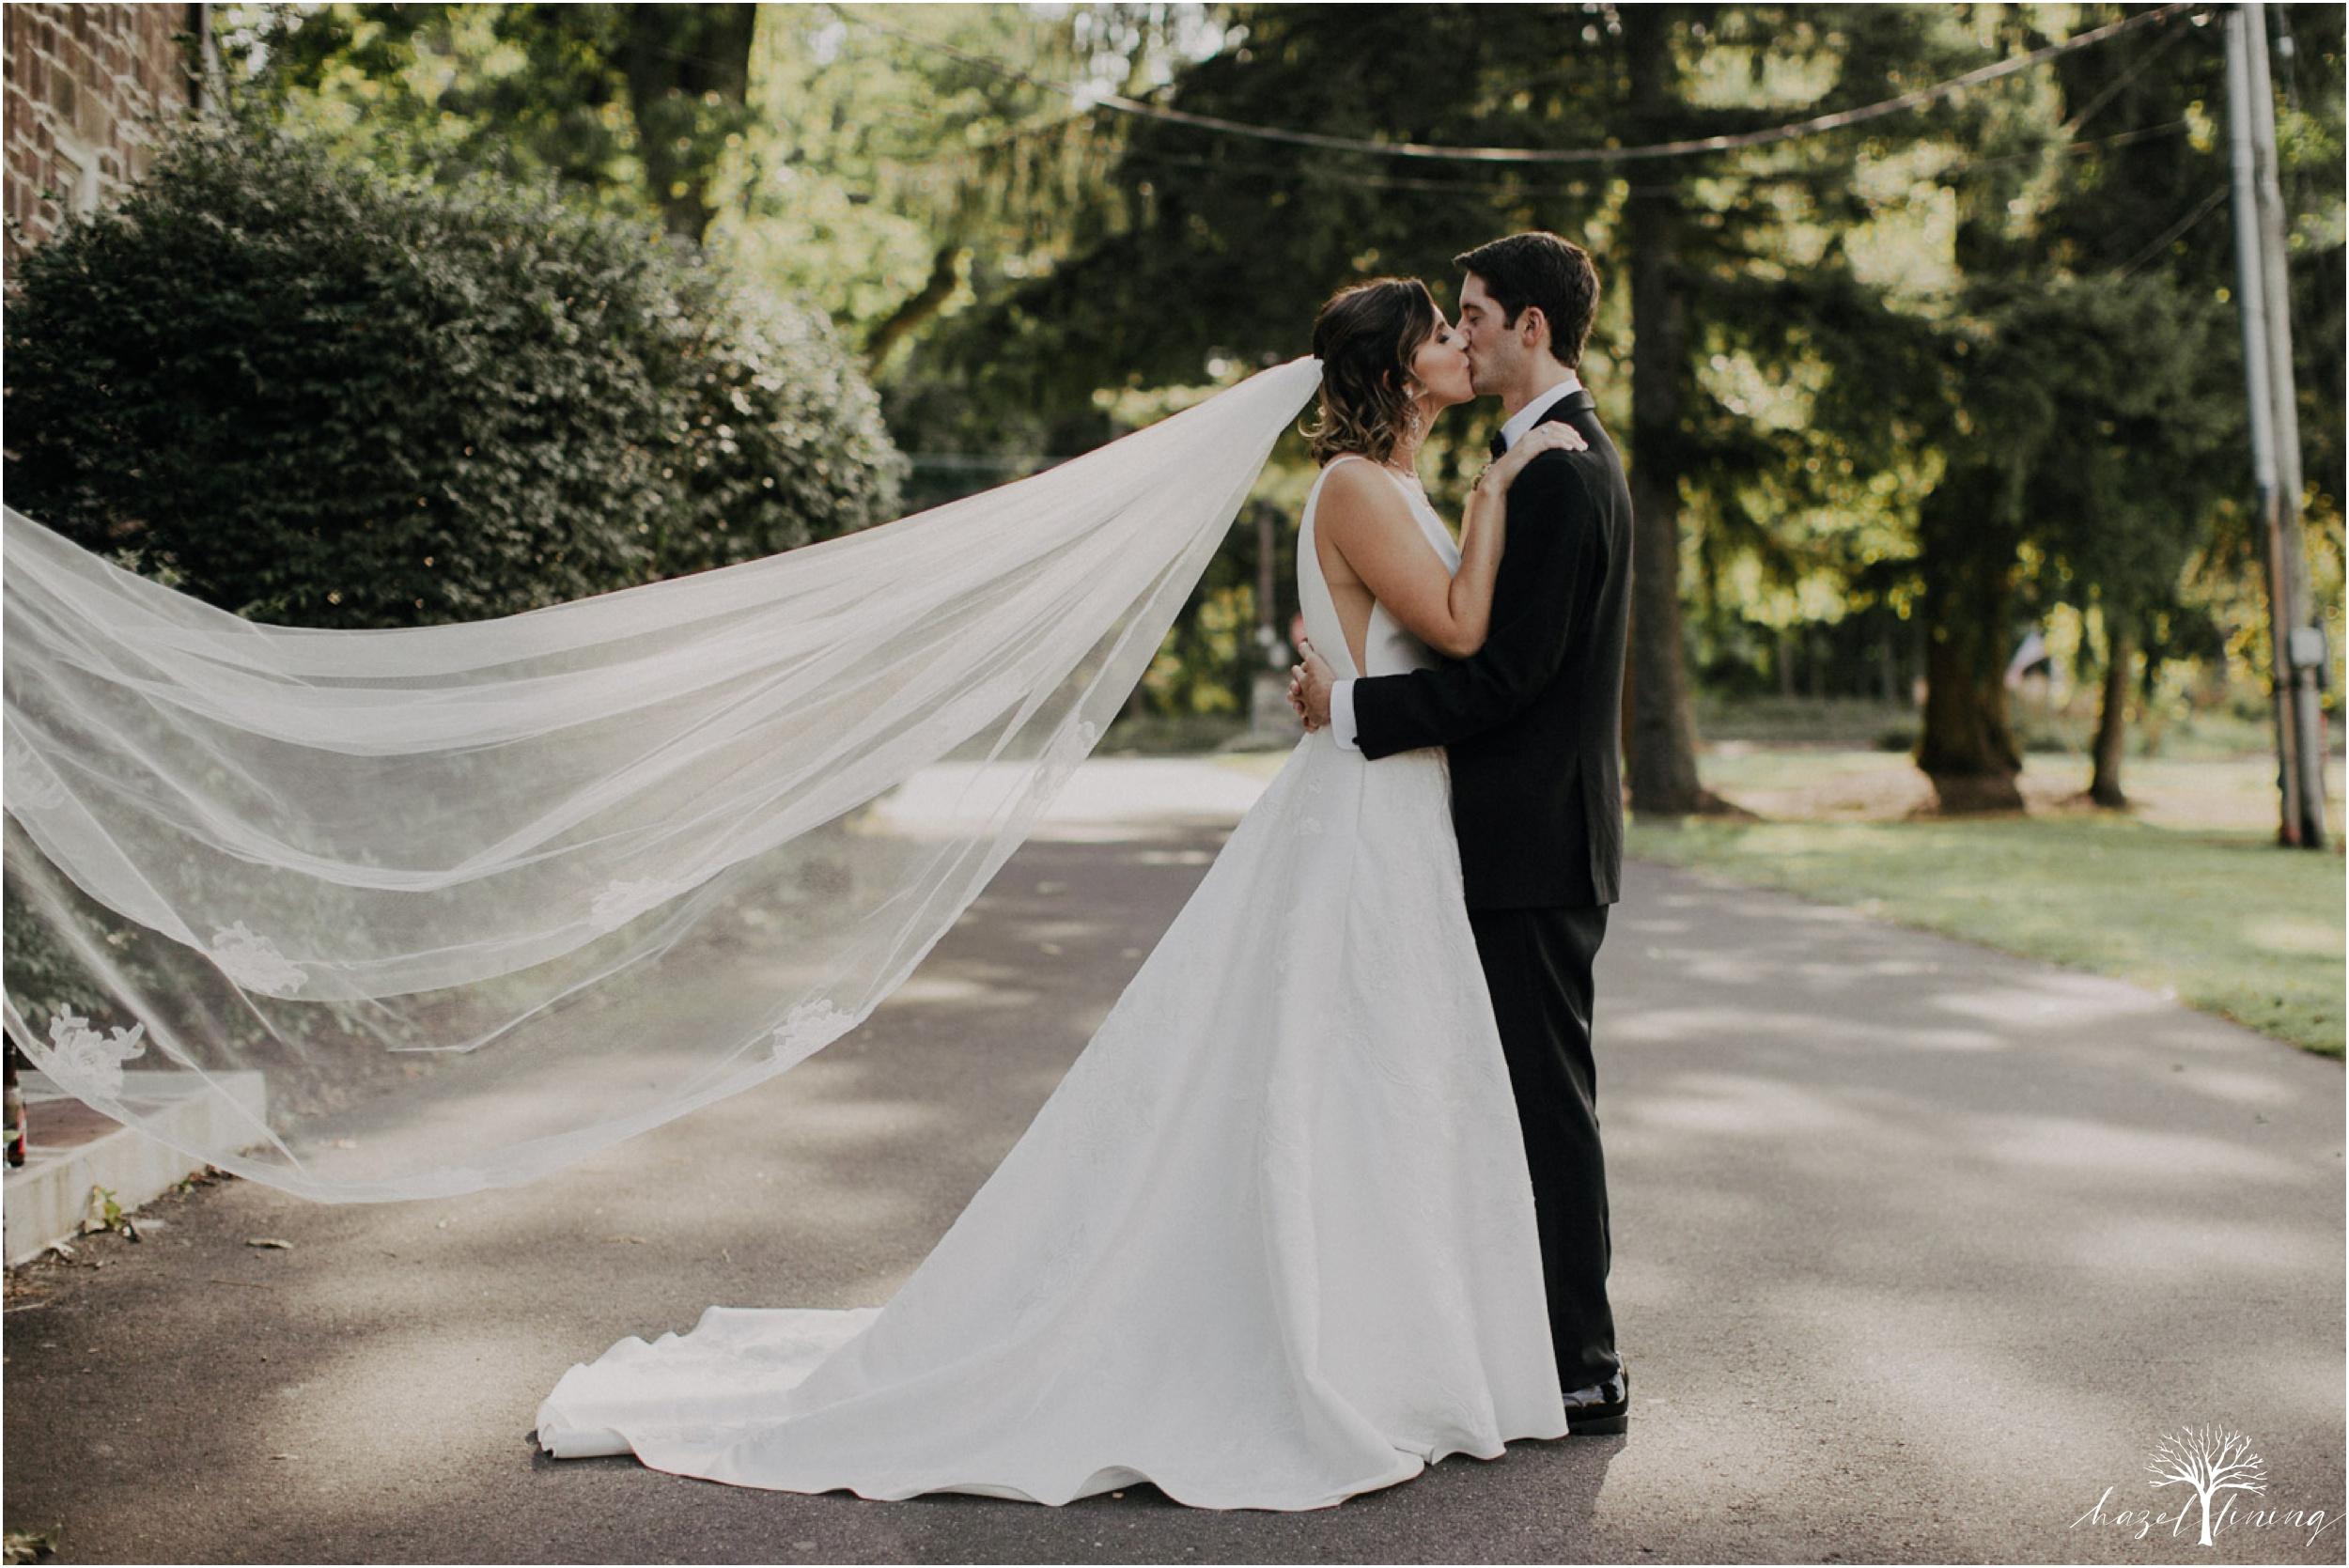 maureen-hepner-anthony-giordano-rose-bank-winery-newtow-pennsylvania-luxury-summer-wedding-hazel-lining-photography-destination-elopement-wedding-engagement-photography_0094.jpg